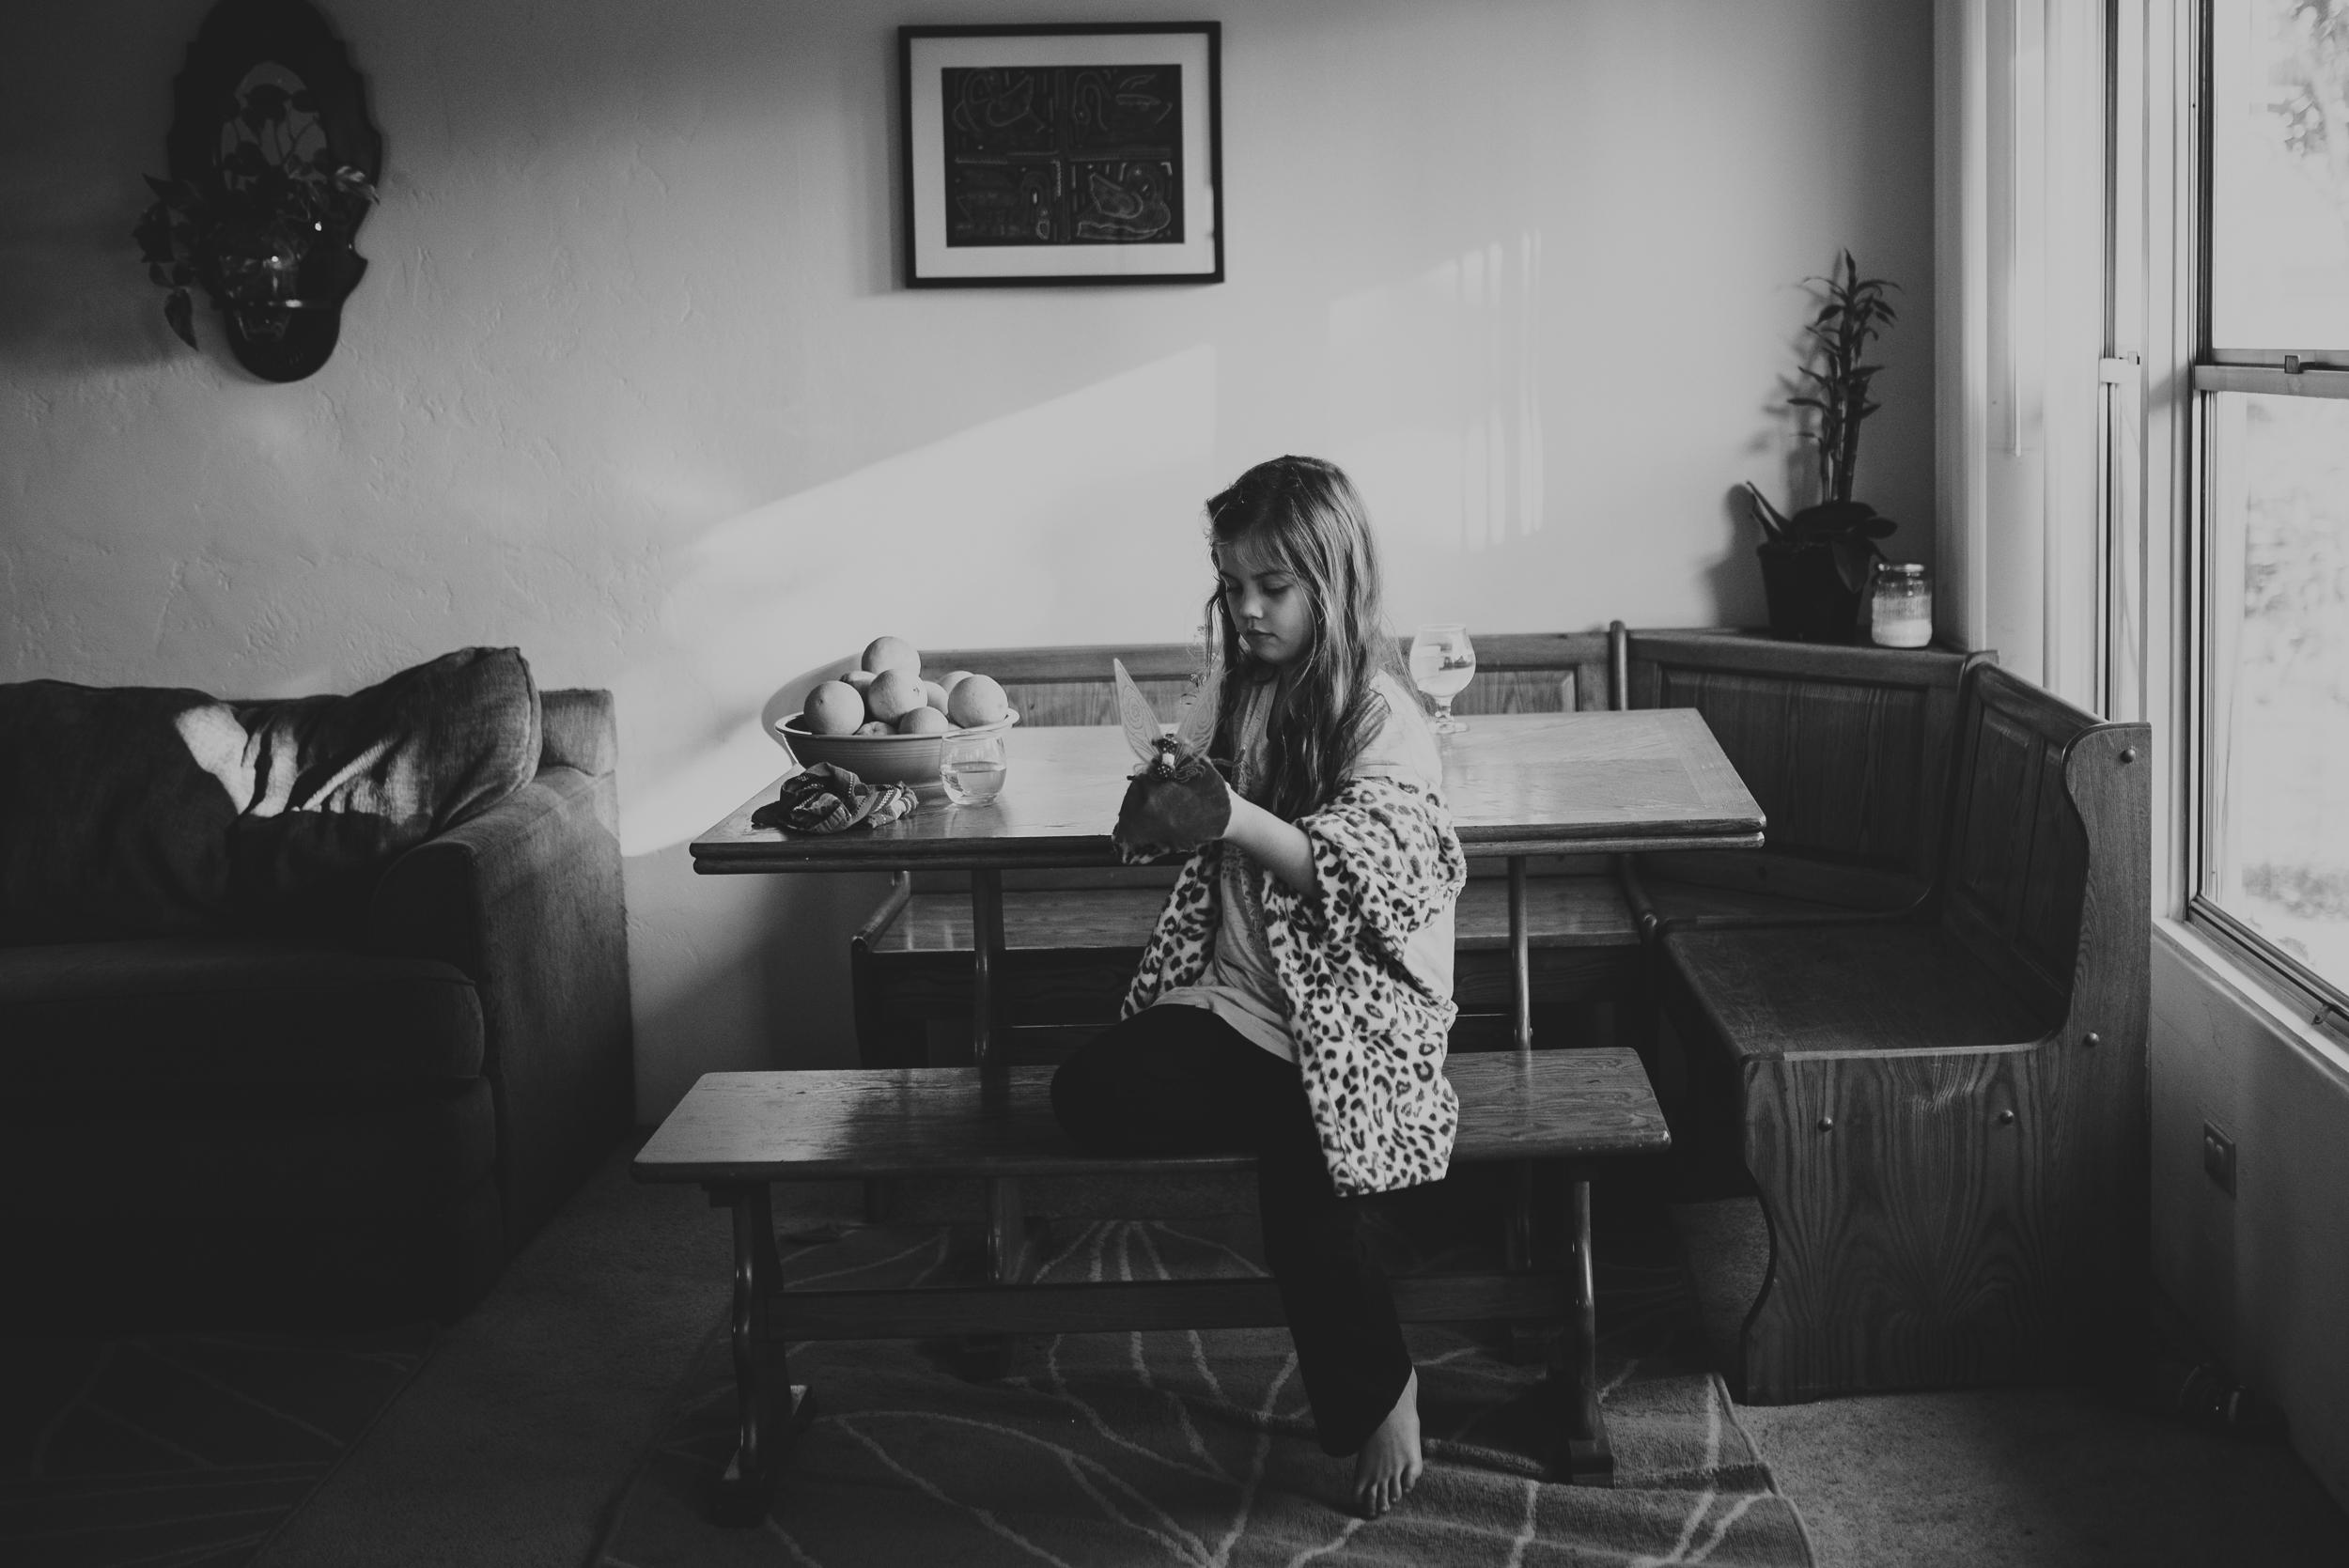 2018-San-Diego-Family-Lifestyle-Newborn-Travel-Vacation-Photographer-Kelsey-Smith-Photography-Coronado-La-Jolla-Encinitas-Solana-Beach-Del-Mar-279.jpg